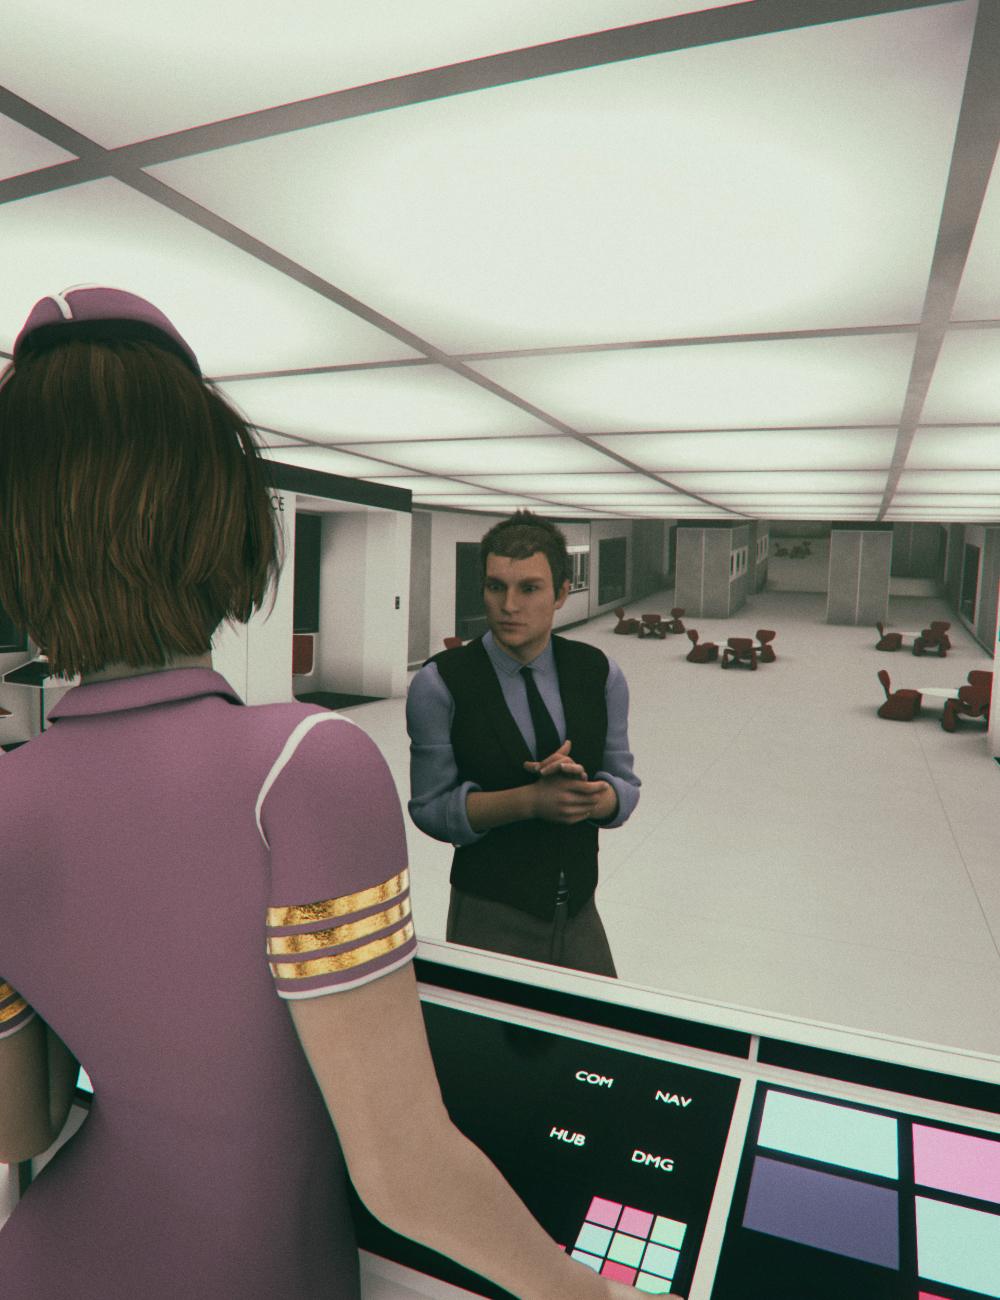 Retro Sci-fi Corridor by: Mely3D, 3D Models by Daz 3D